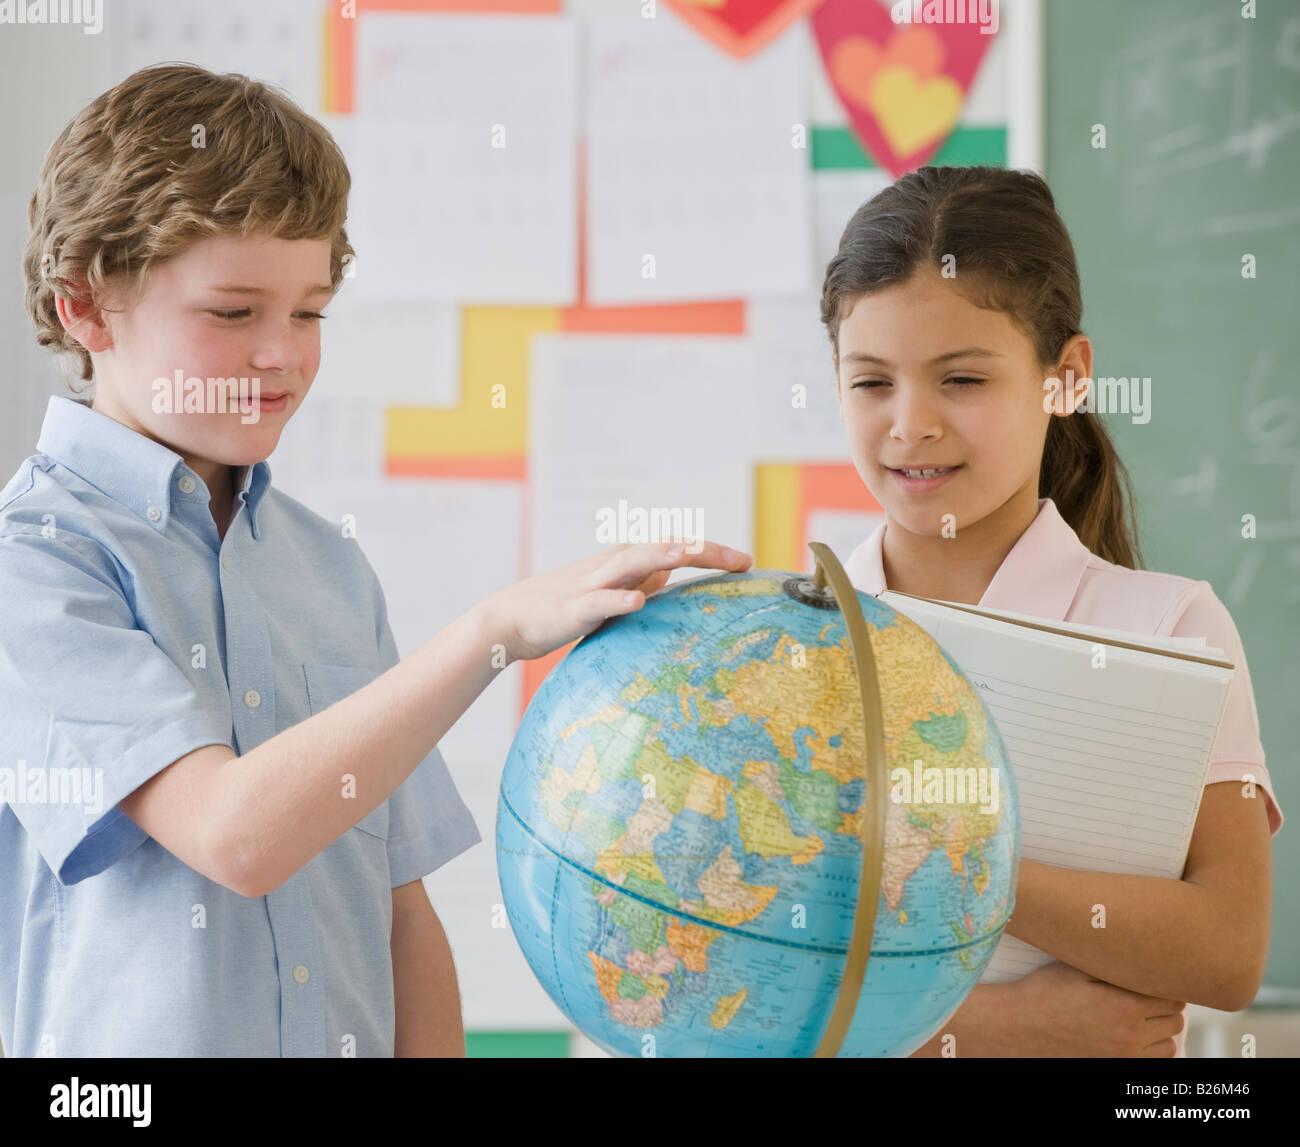 Multi-ethnic school children looking at globe - Stock Image